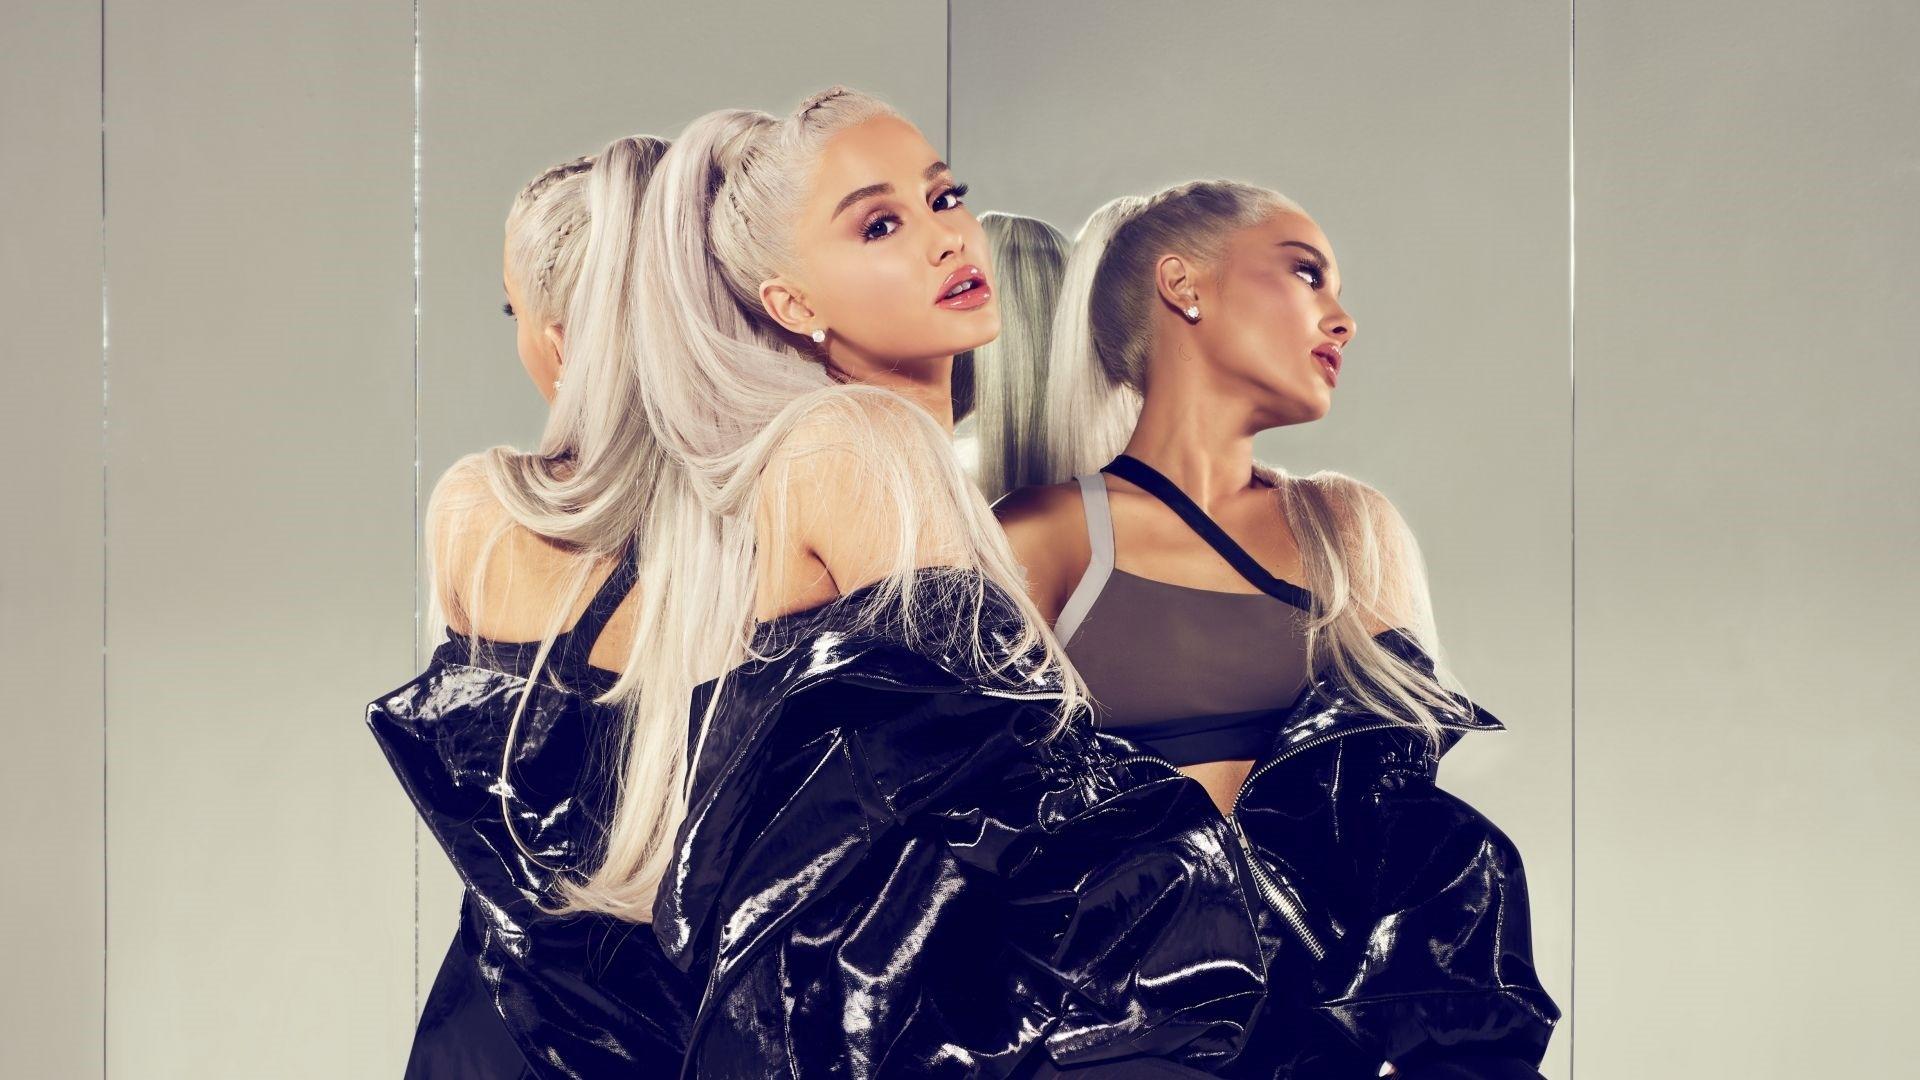 Ariana Grande Aesthetic Image